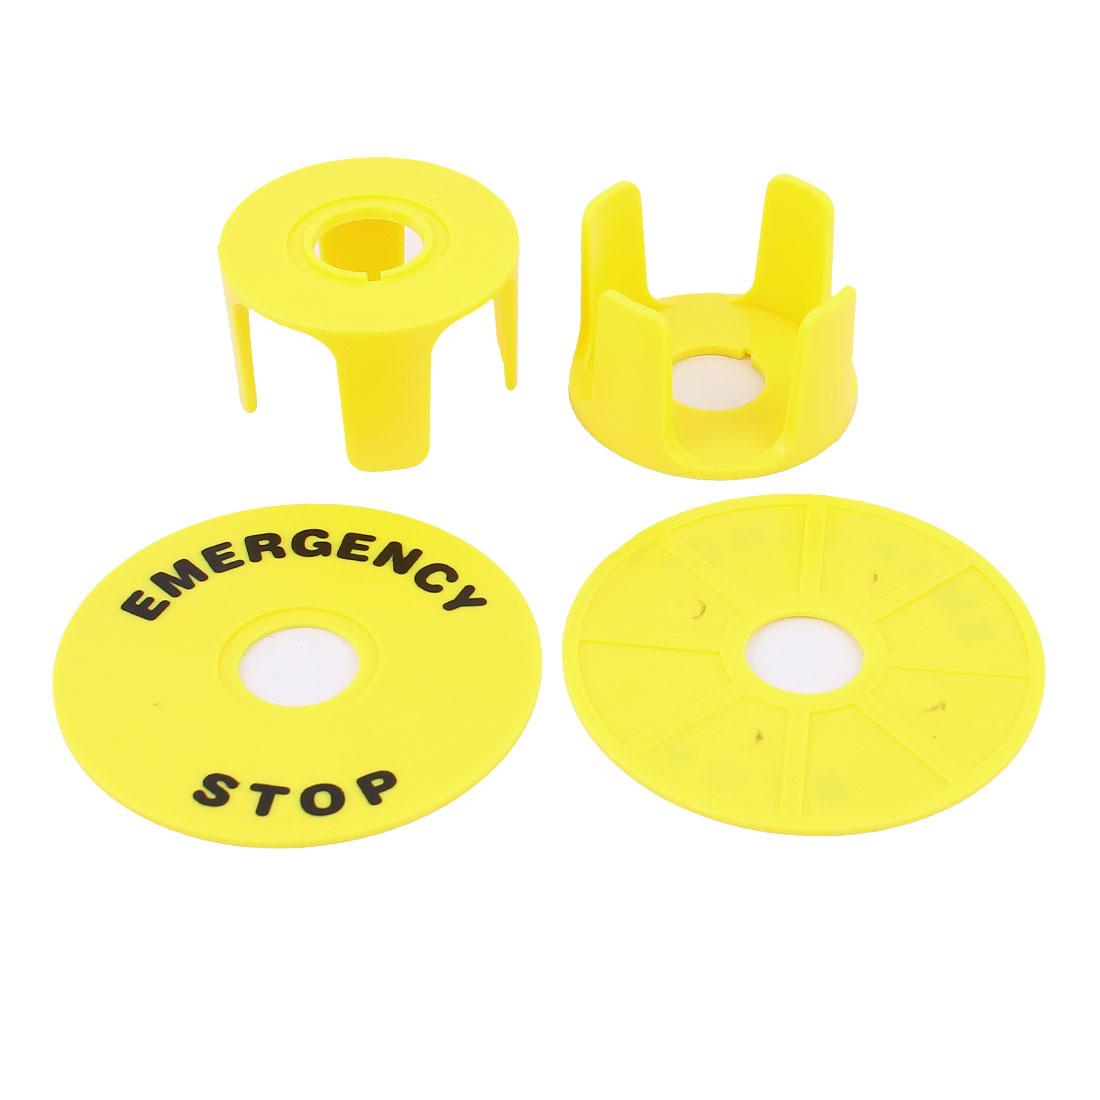 2Pcs Black Emergency Stop Print 22mm Cutout Yellow Plastic Push Button Switch Panel Label Plate Set